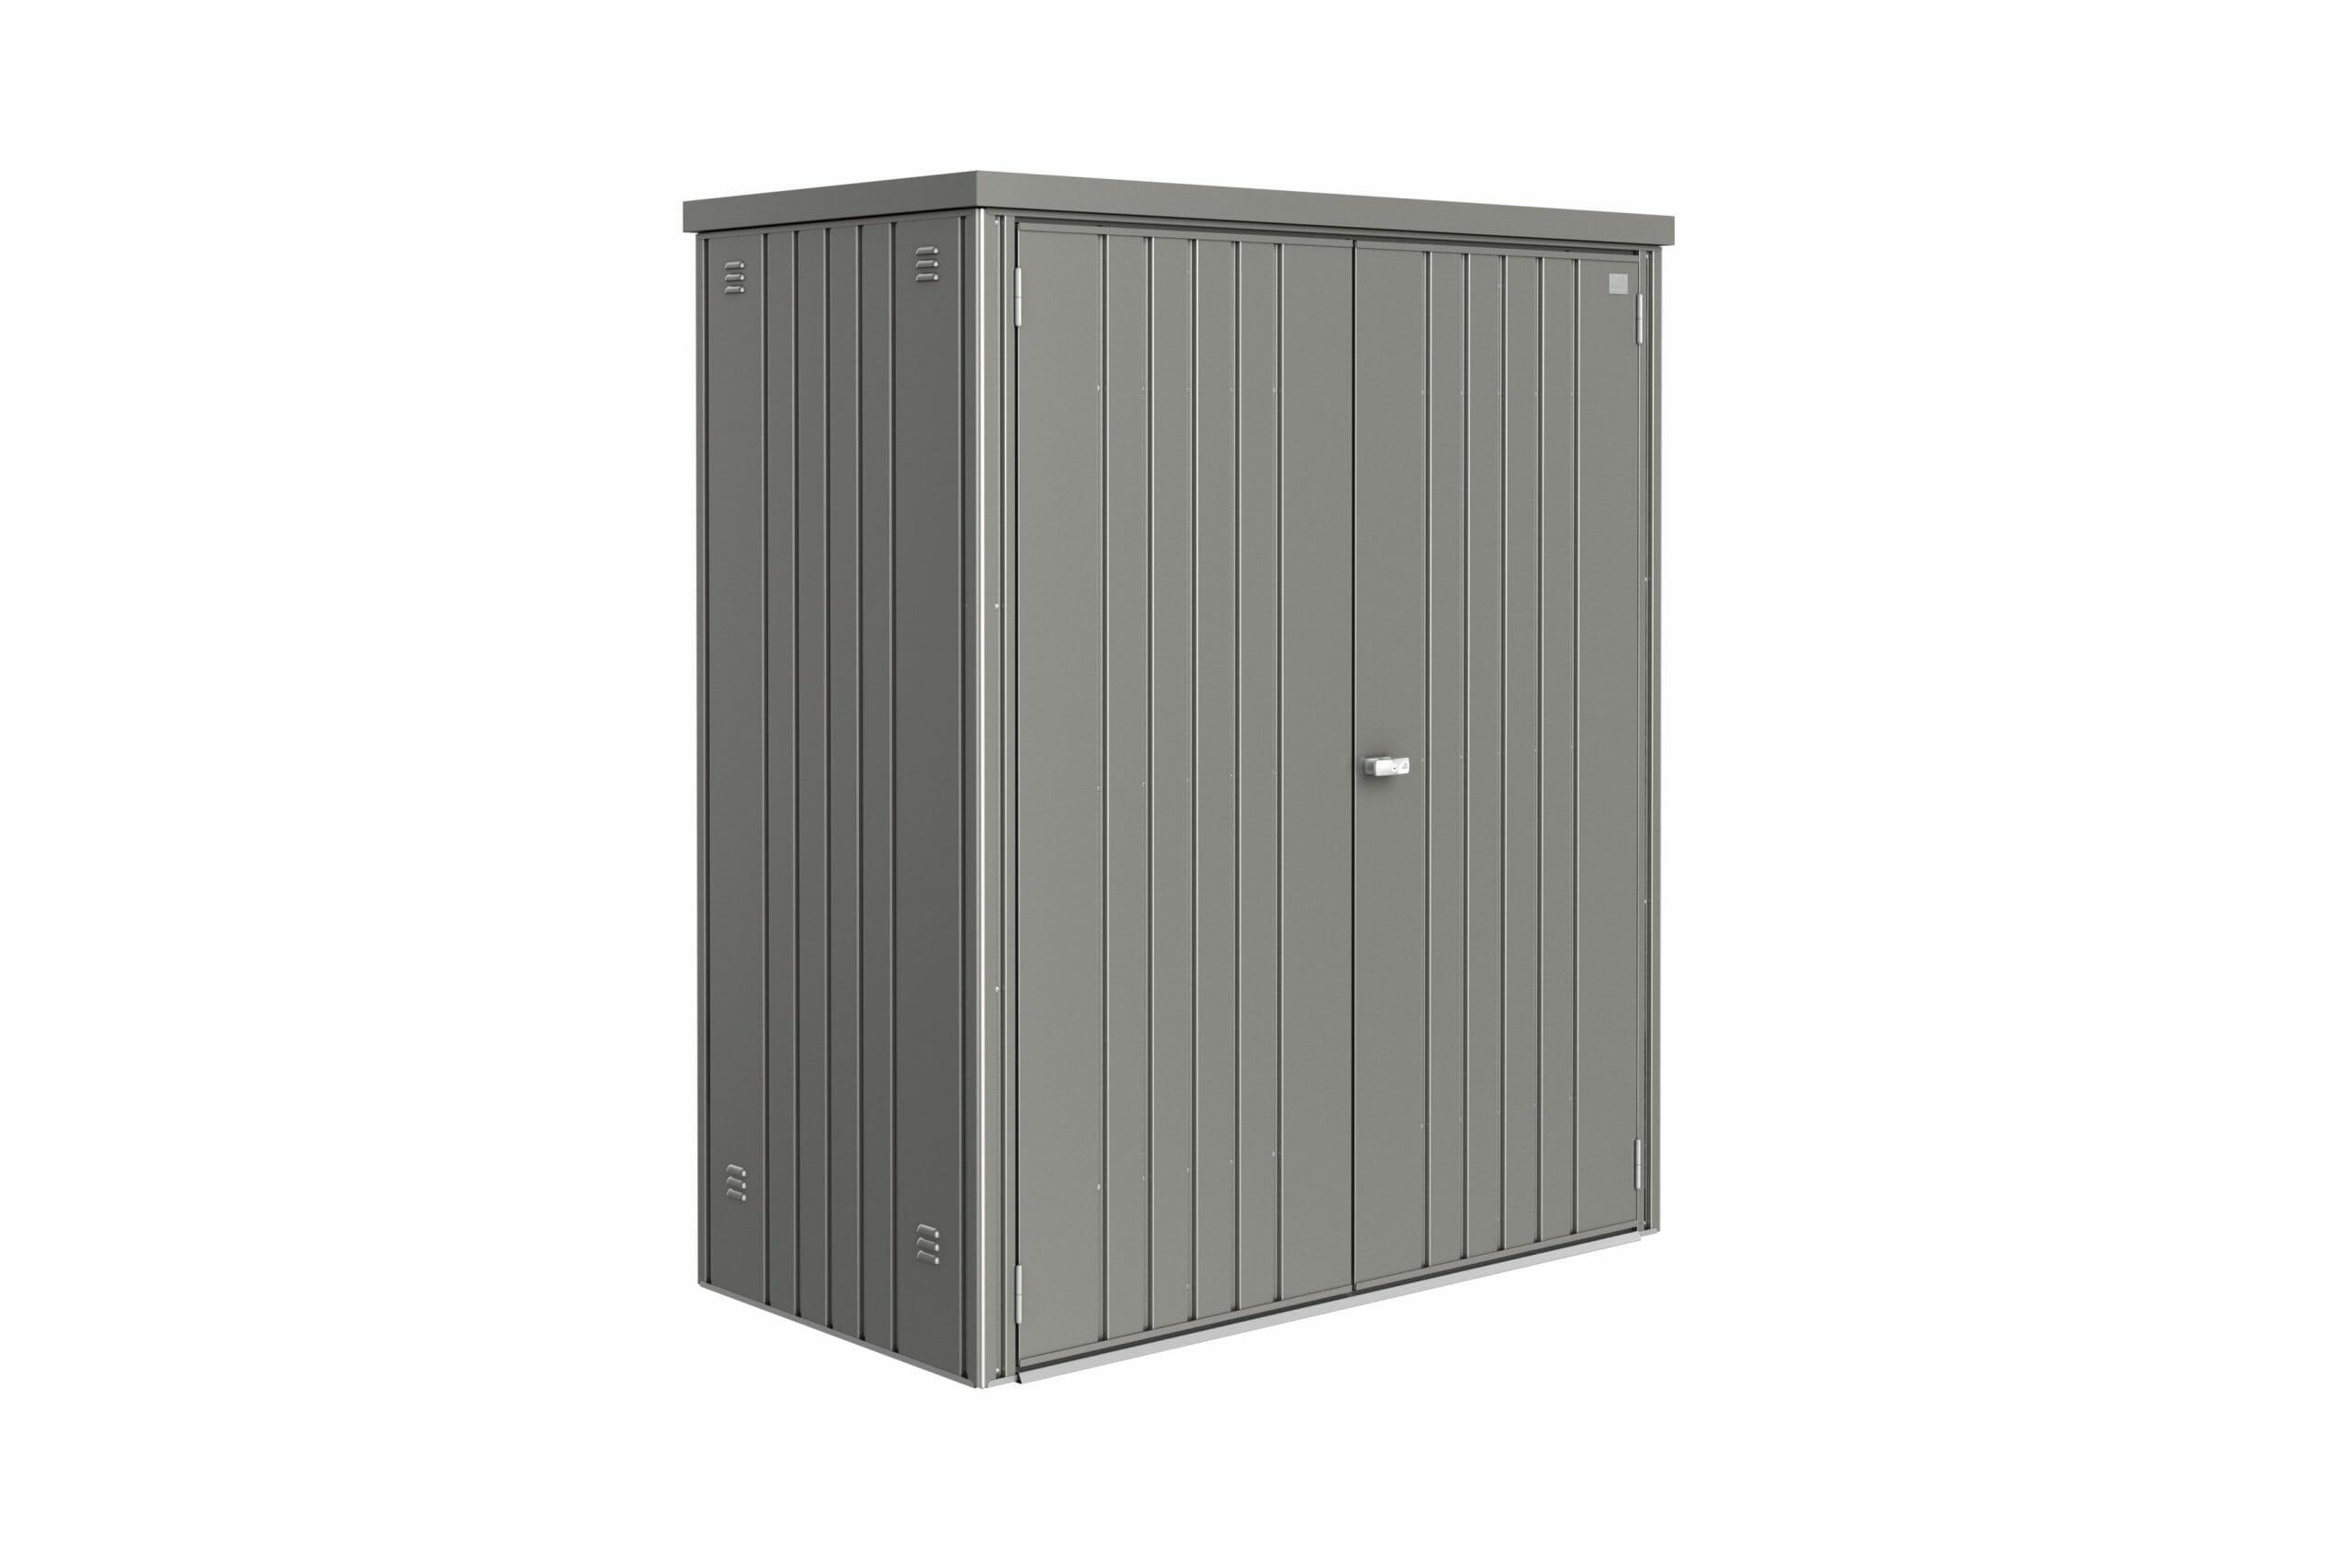 biohort-equipment-locker-30010_Geraeteschrank_150_quarzgrau_metallic_Studio-dd22